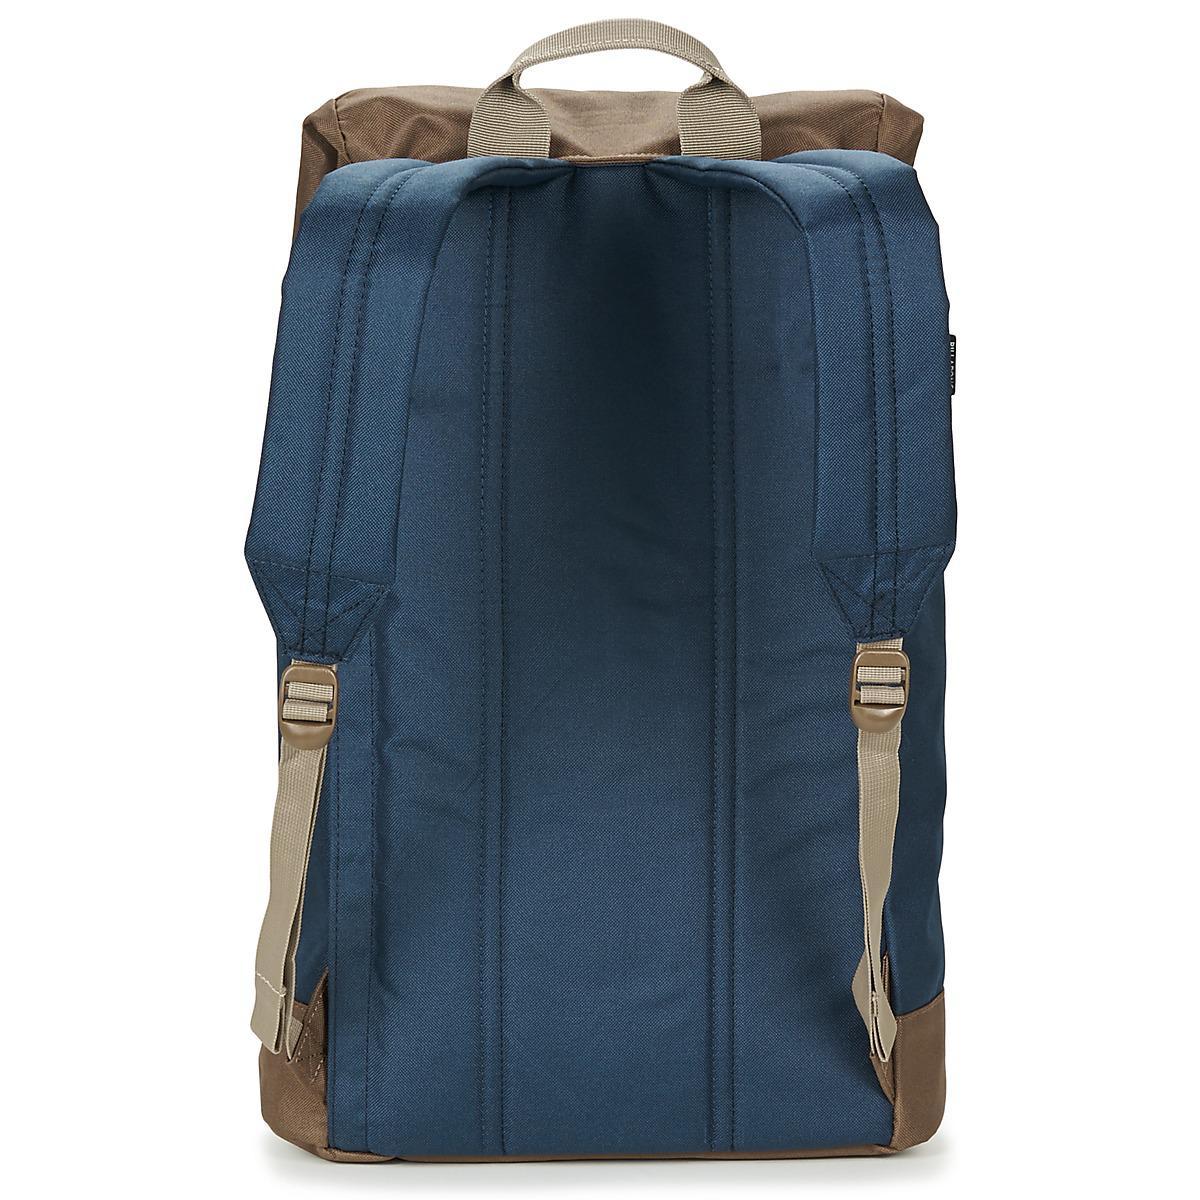 Billabong Track Pack Women's Backpack In Blue